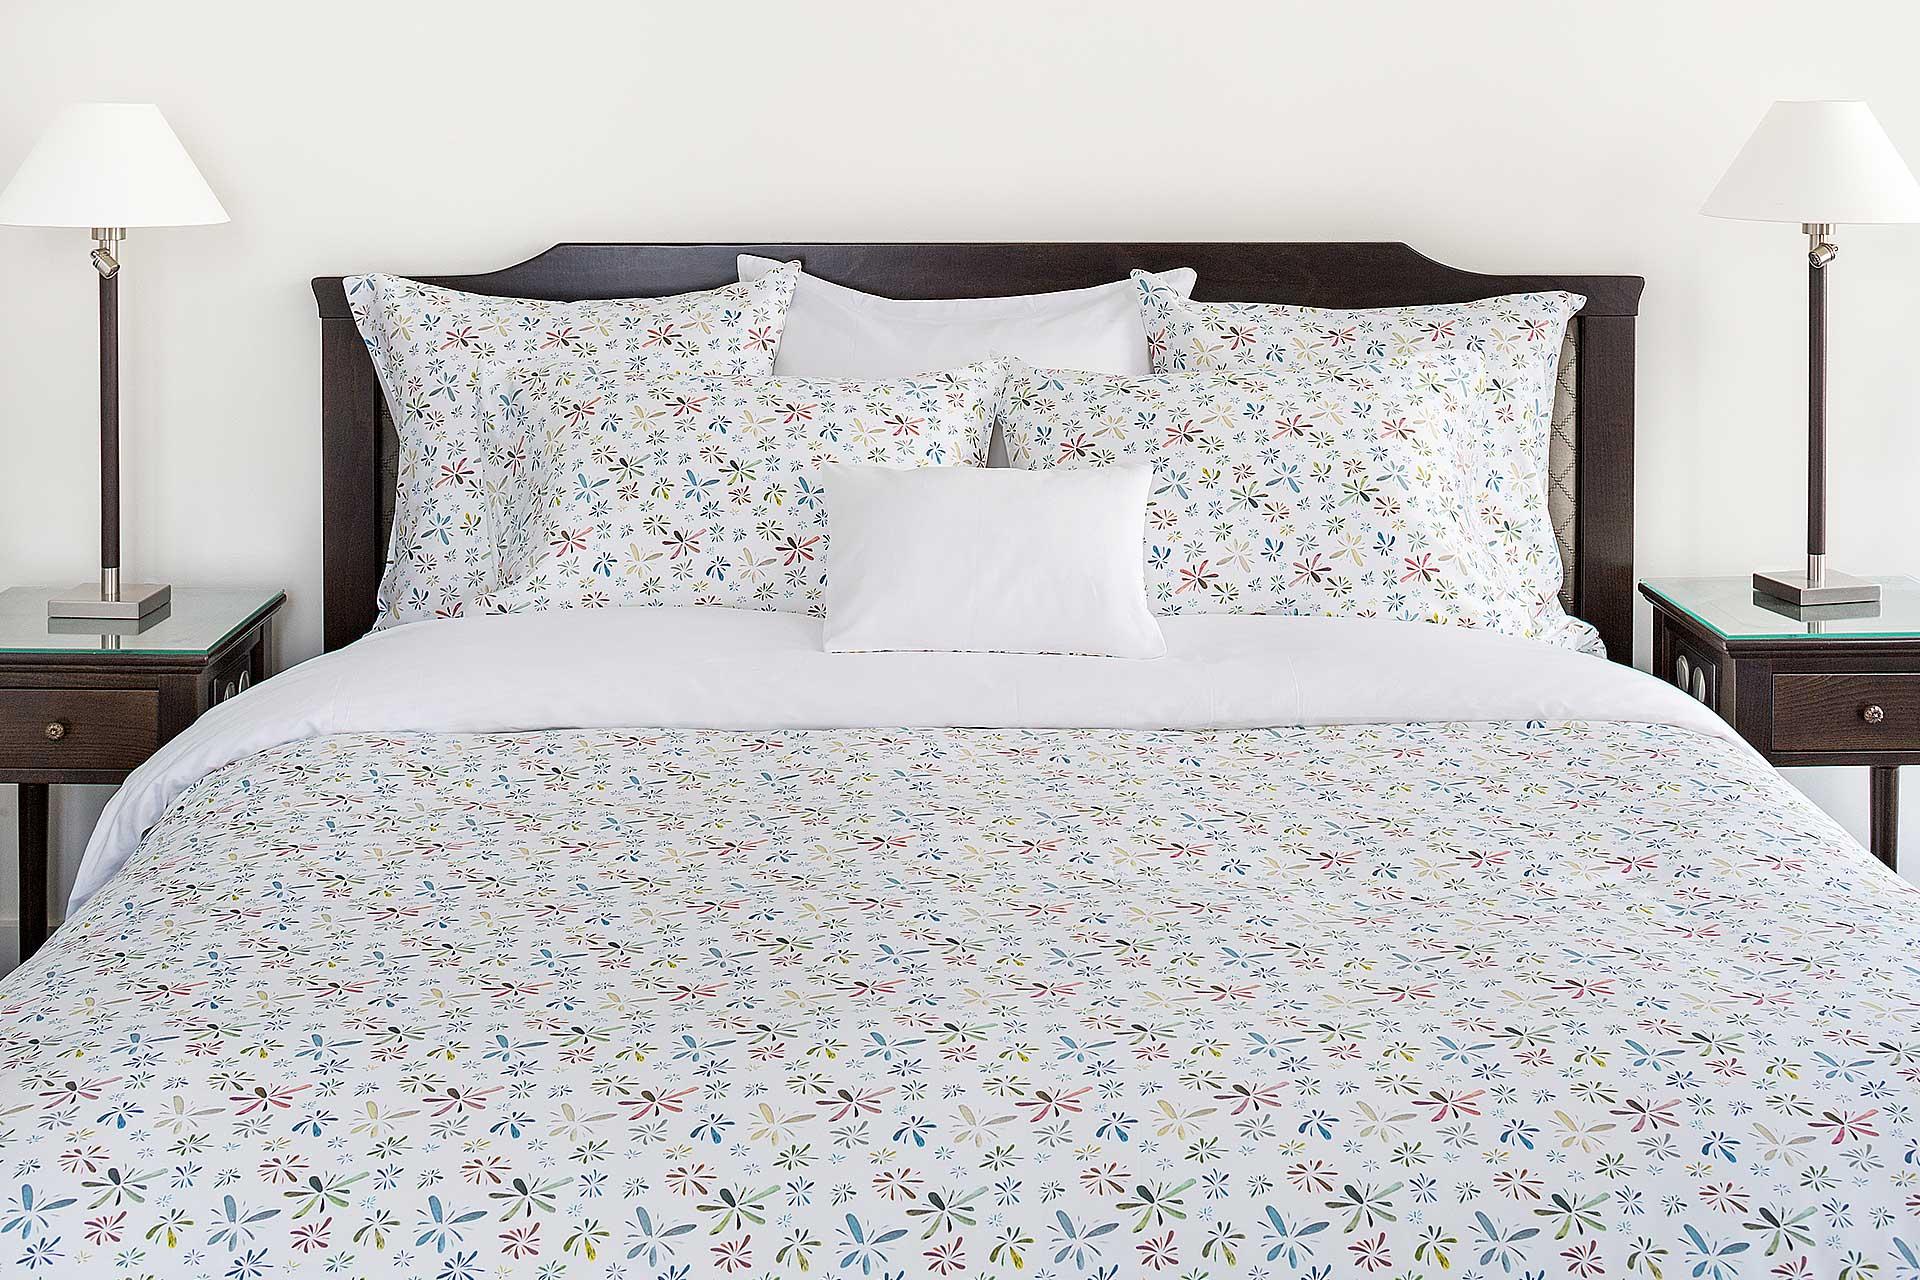 rio lisa galimberti linge de lit haut de gamme. Black Bedroom Furniture Sets. Home Design Ideas